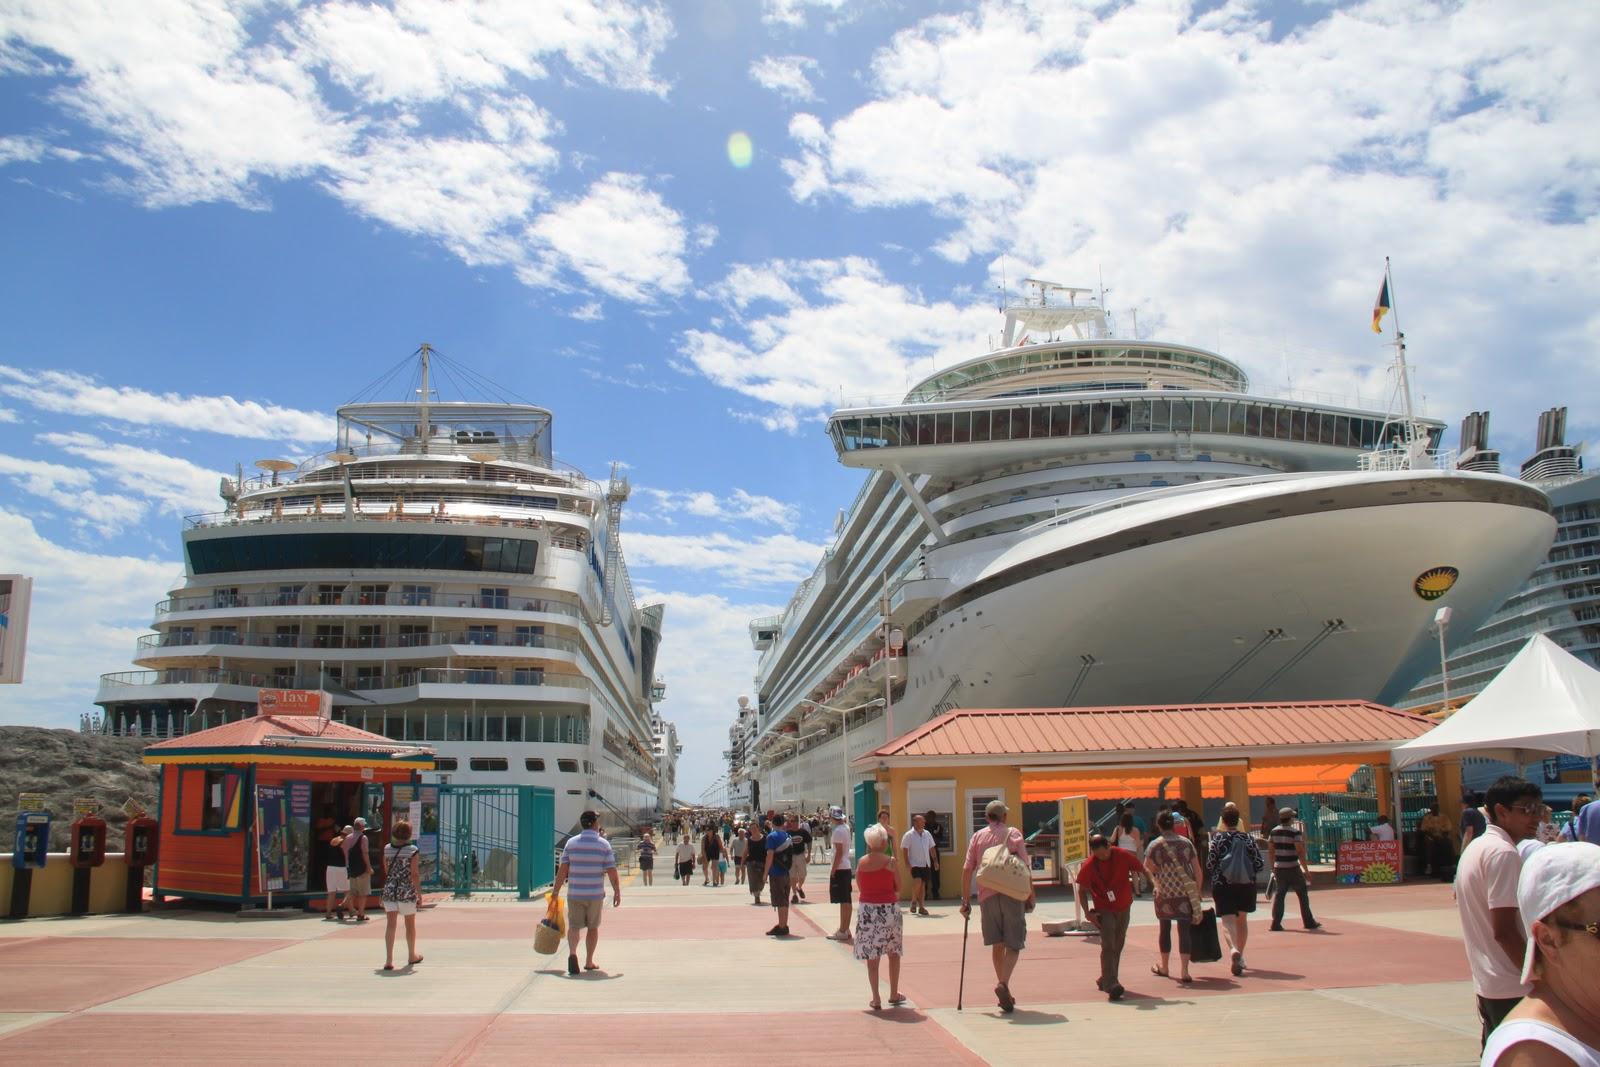 Uncategorized Travelwithstuart Page - Port or starboard side of cruise ship